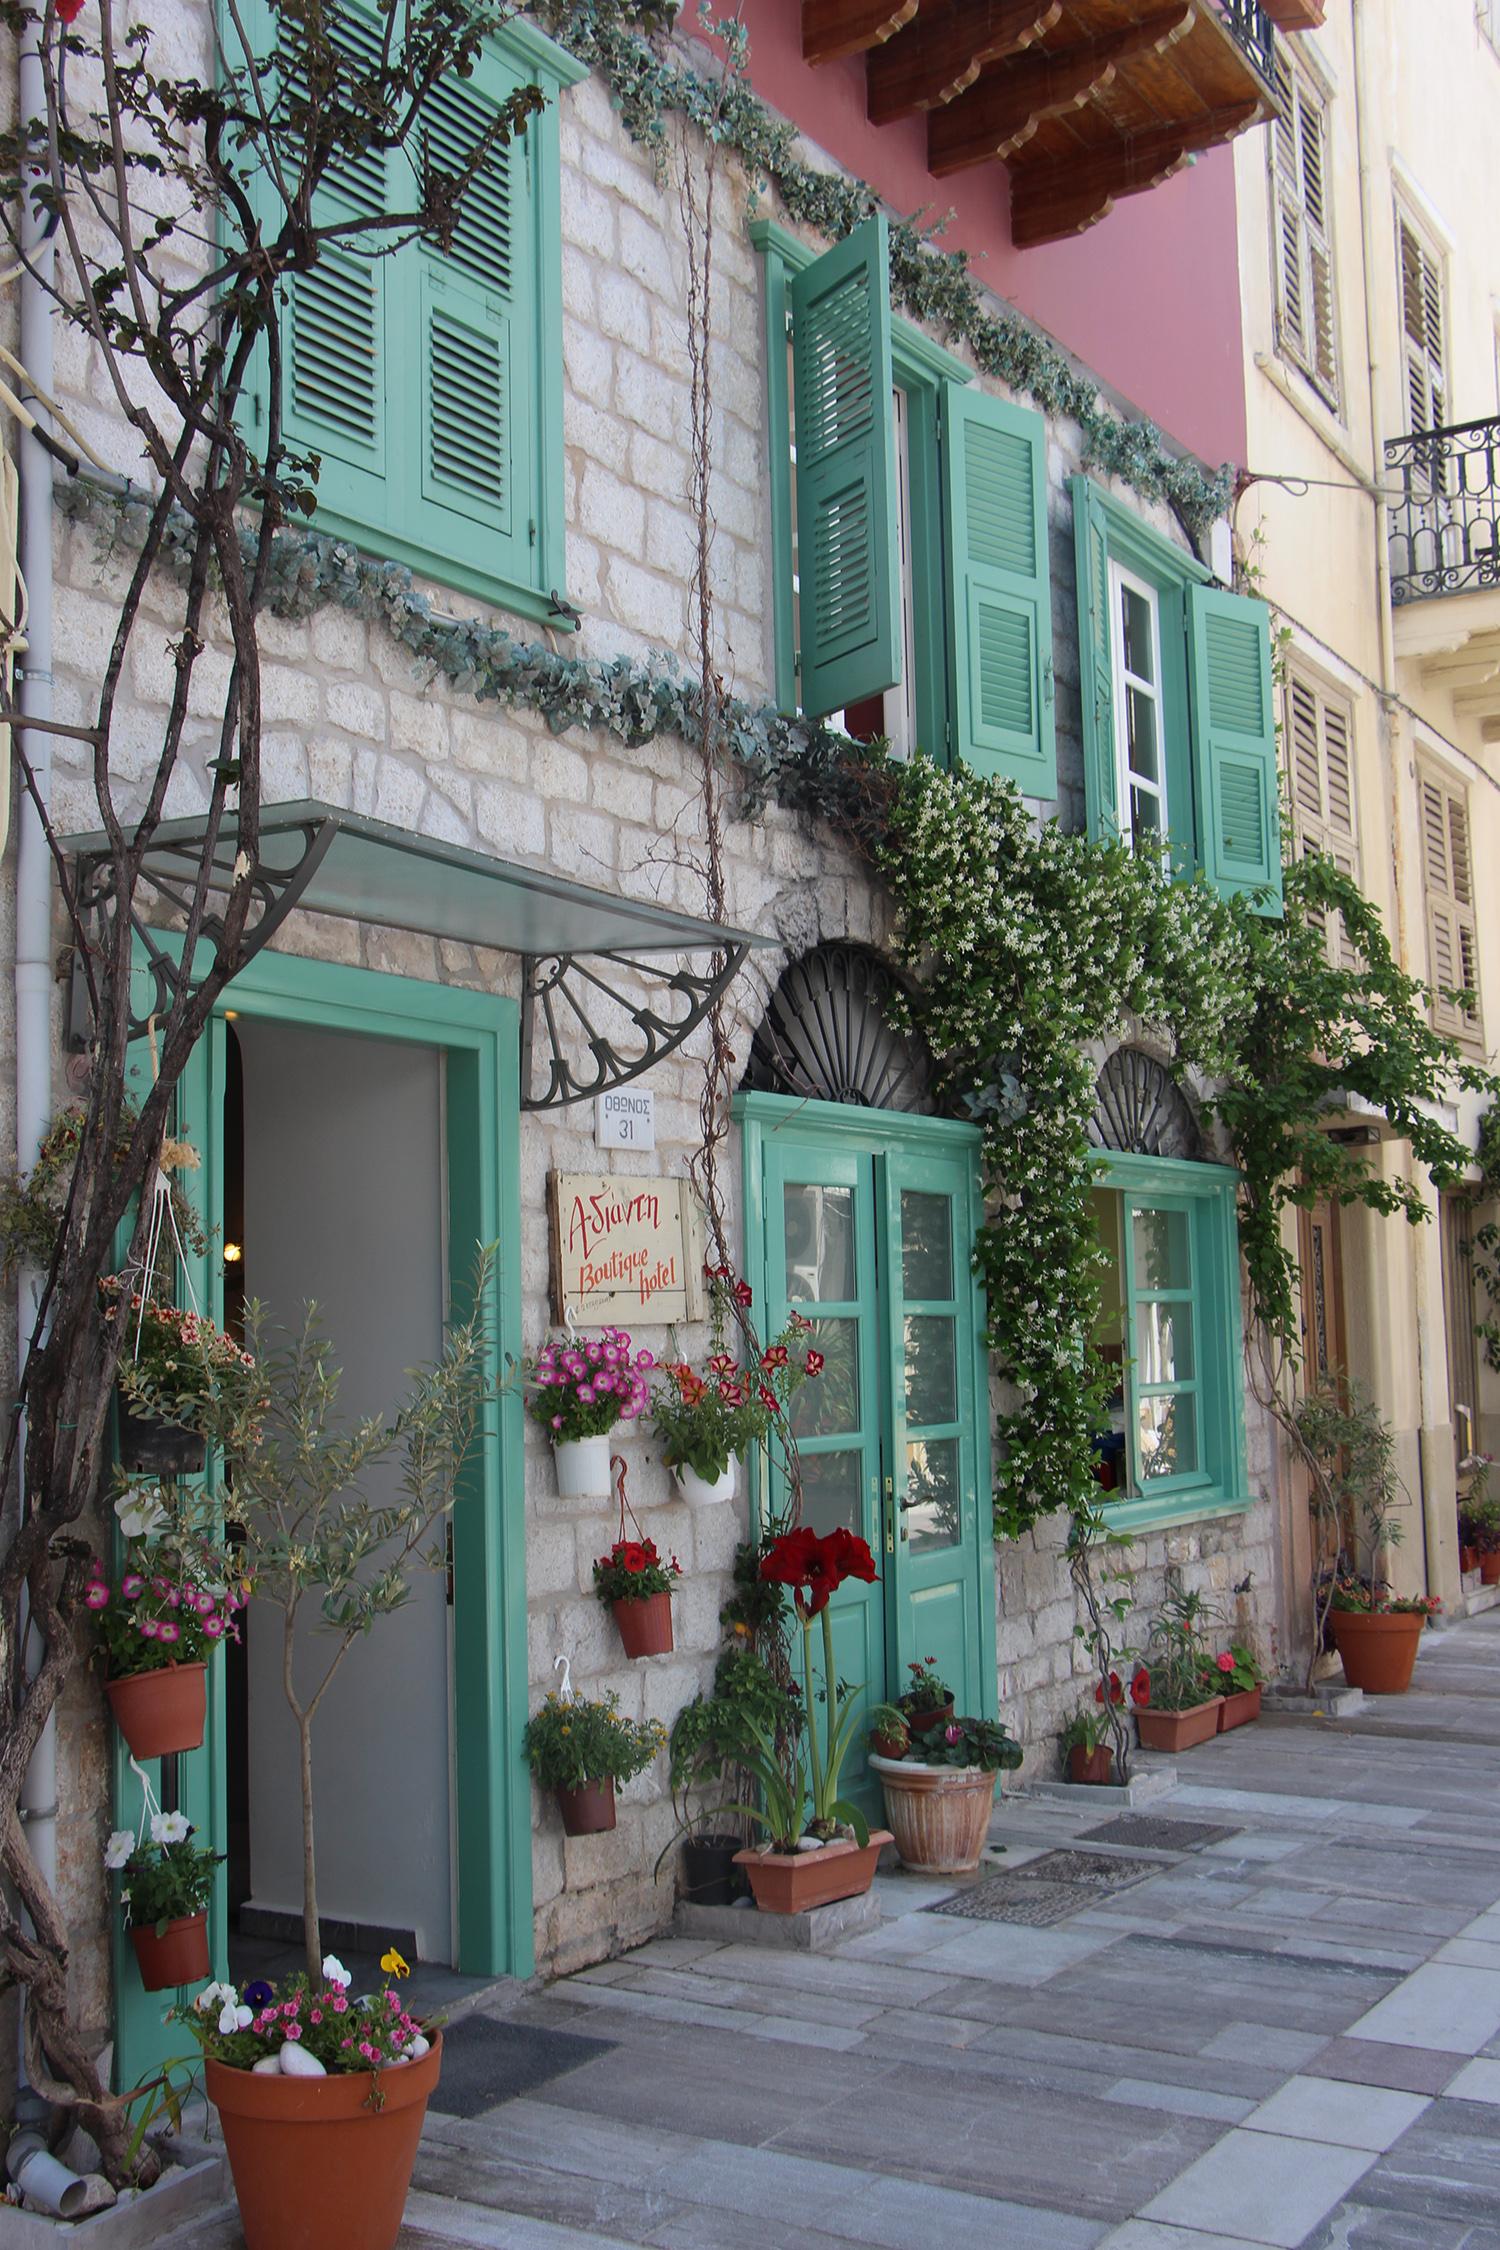 nafplio greece turquoise house pretty building